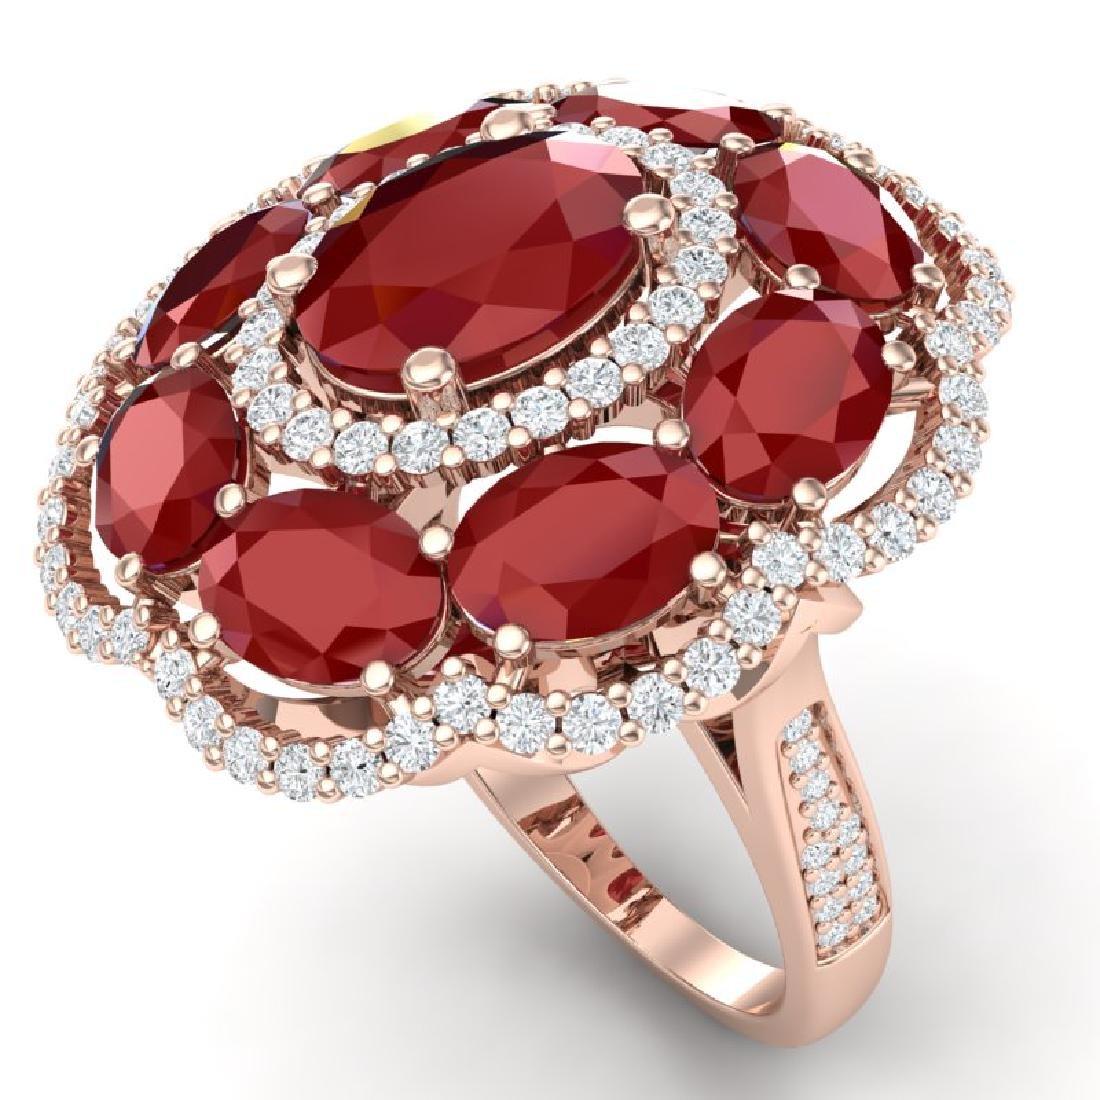 14.4 CTW Royalty Designer Ruby & VS Diamond Ring 18K